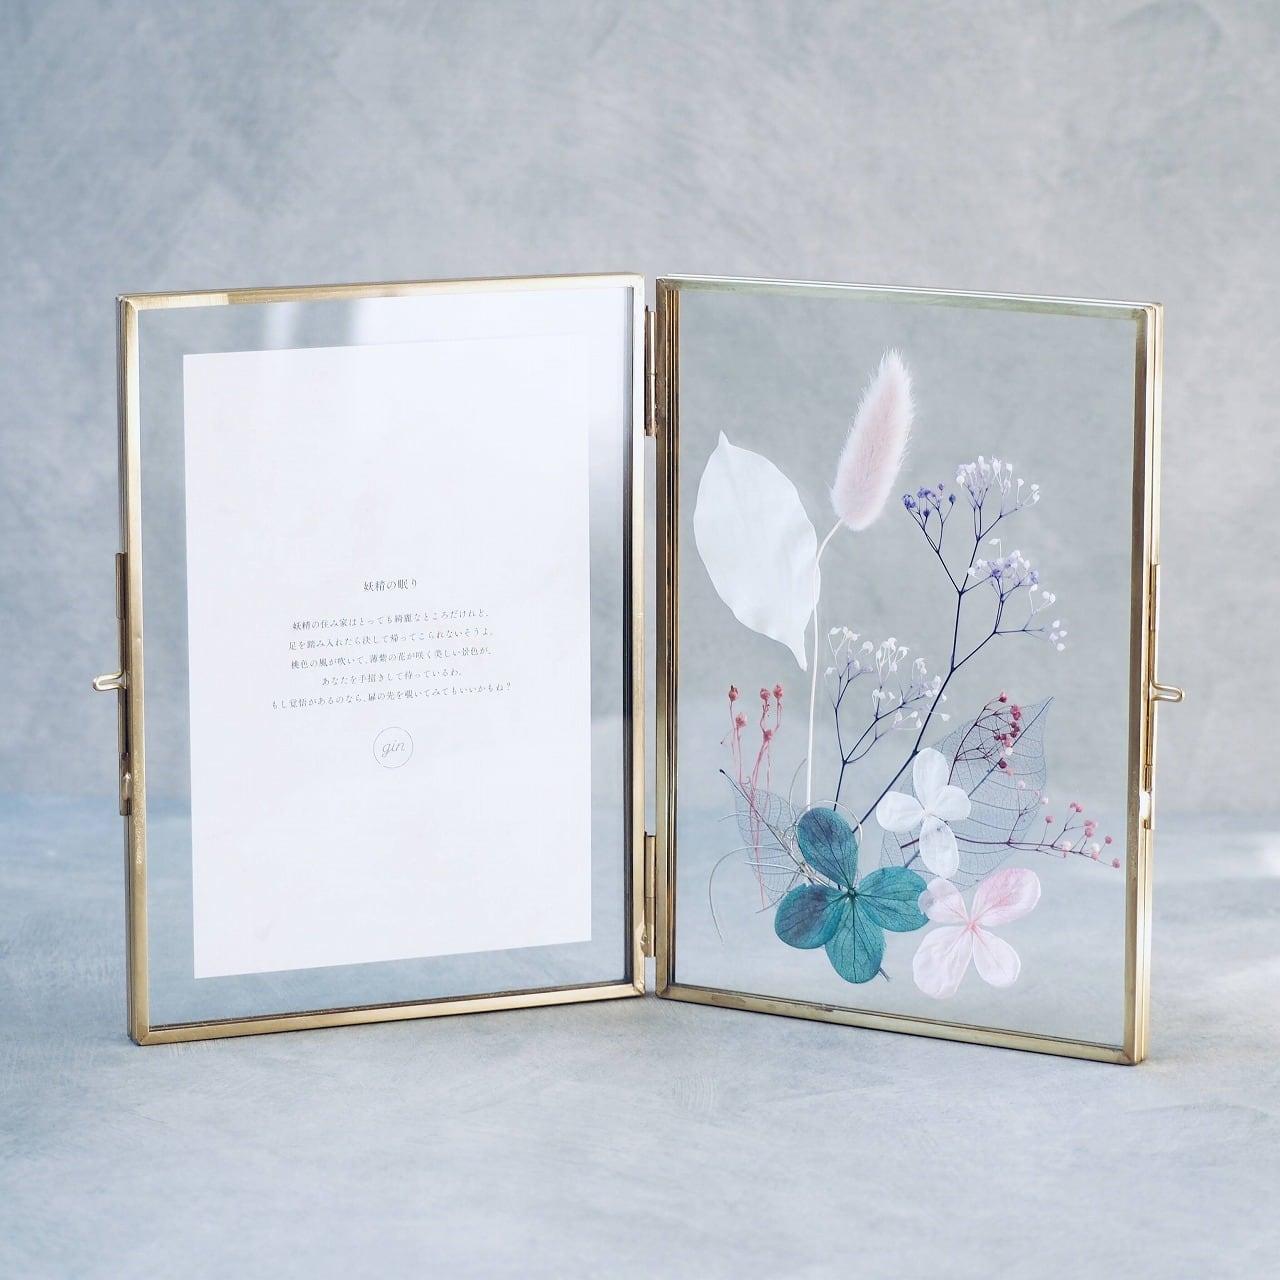 Flower art book 『妖精の眠り』